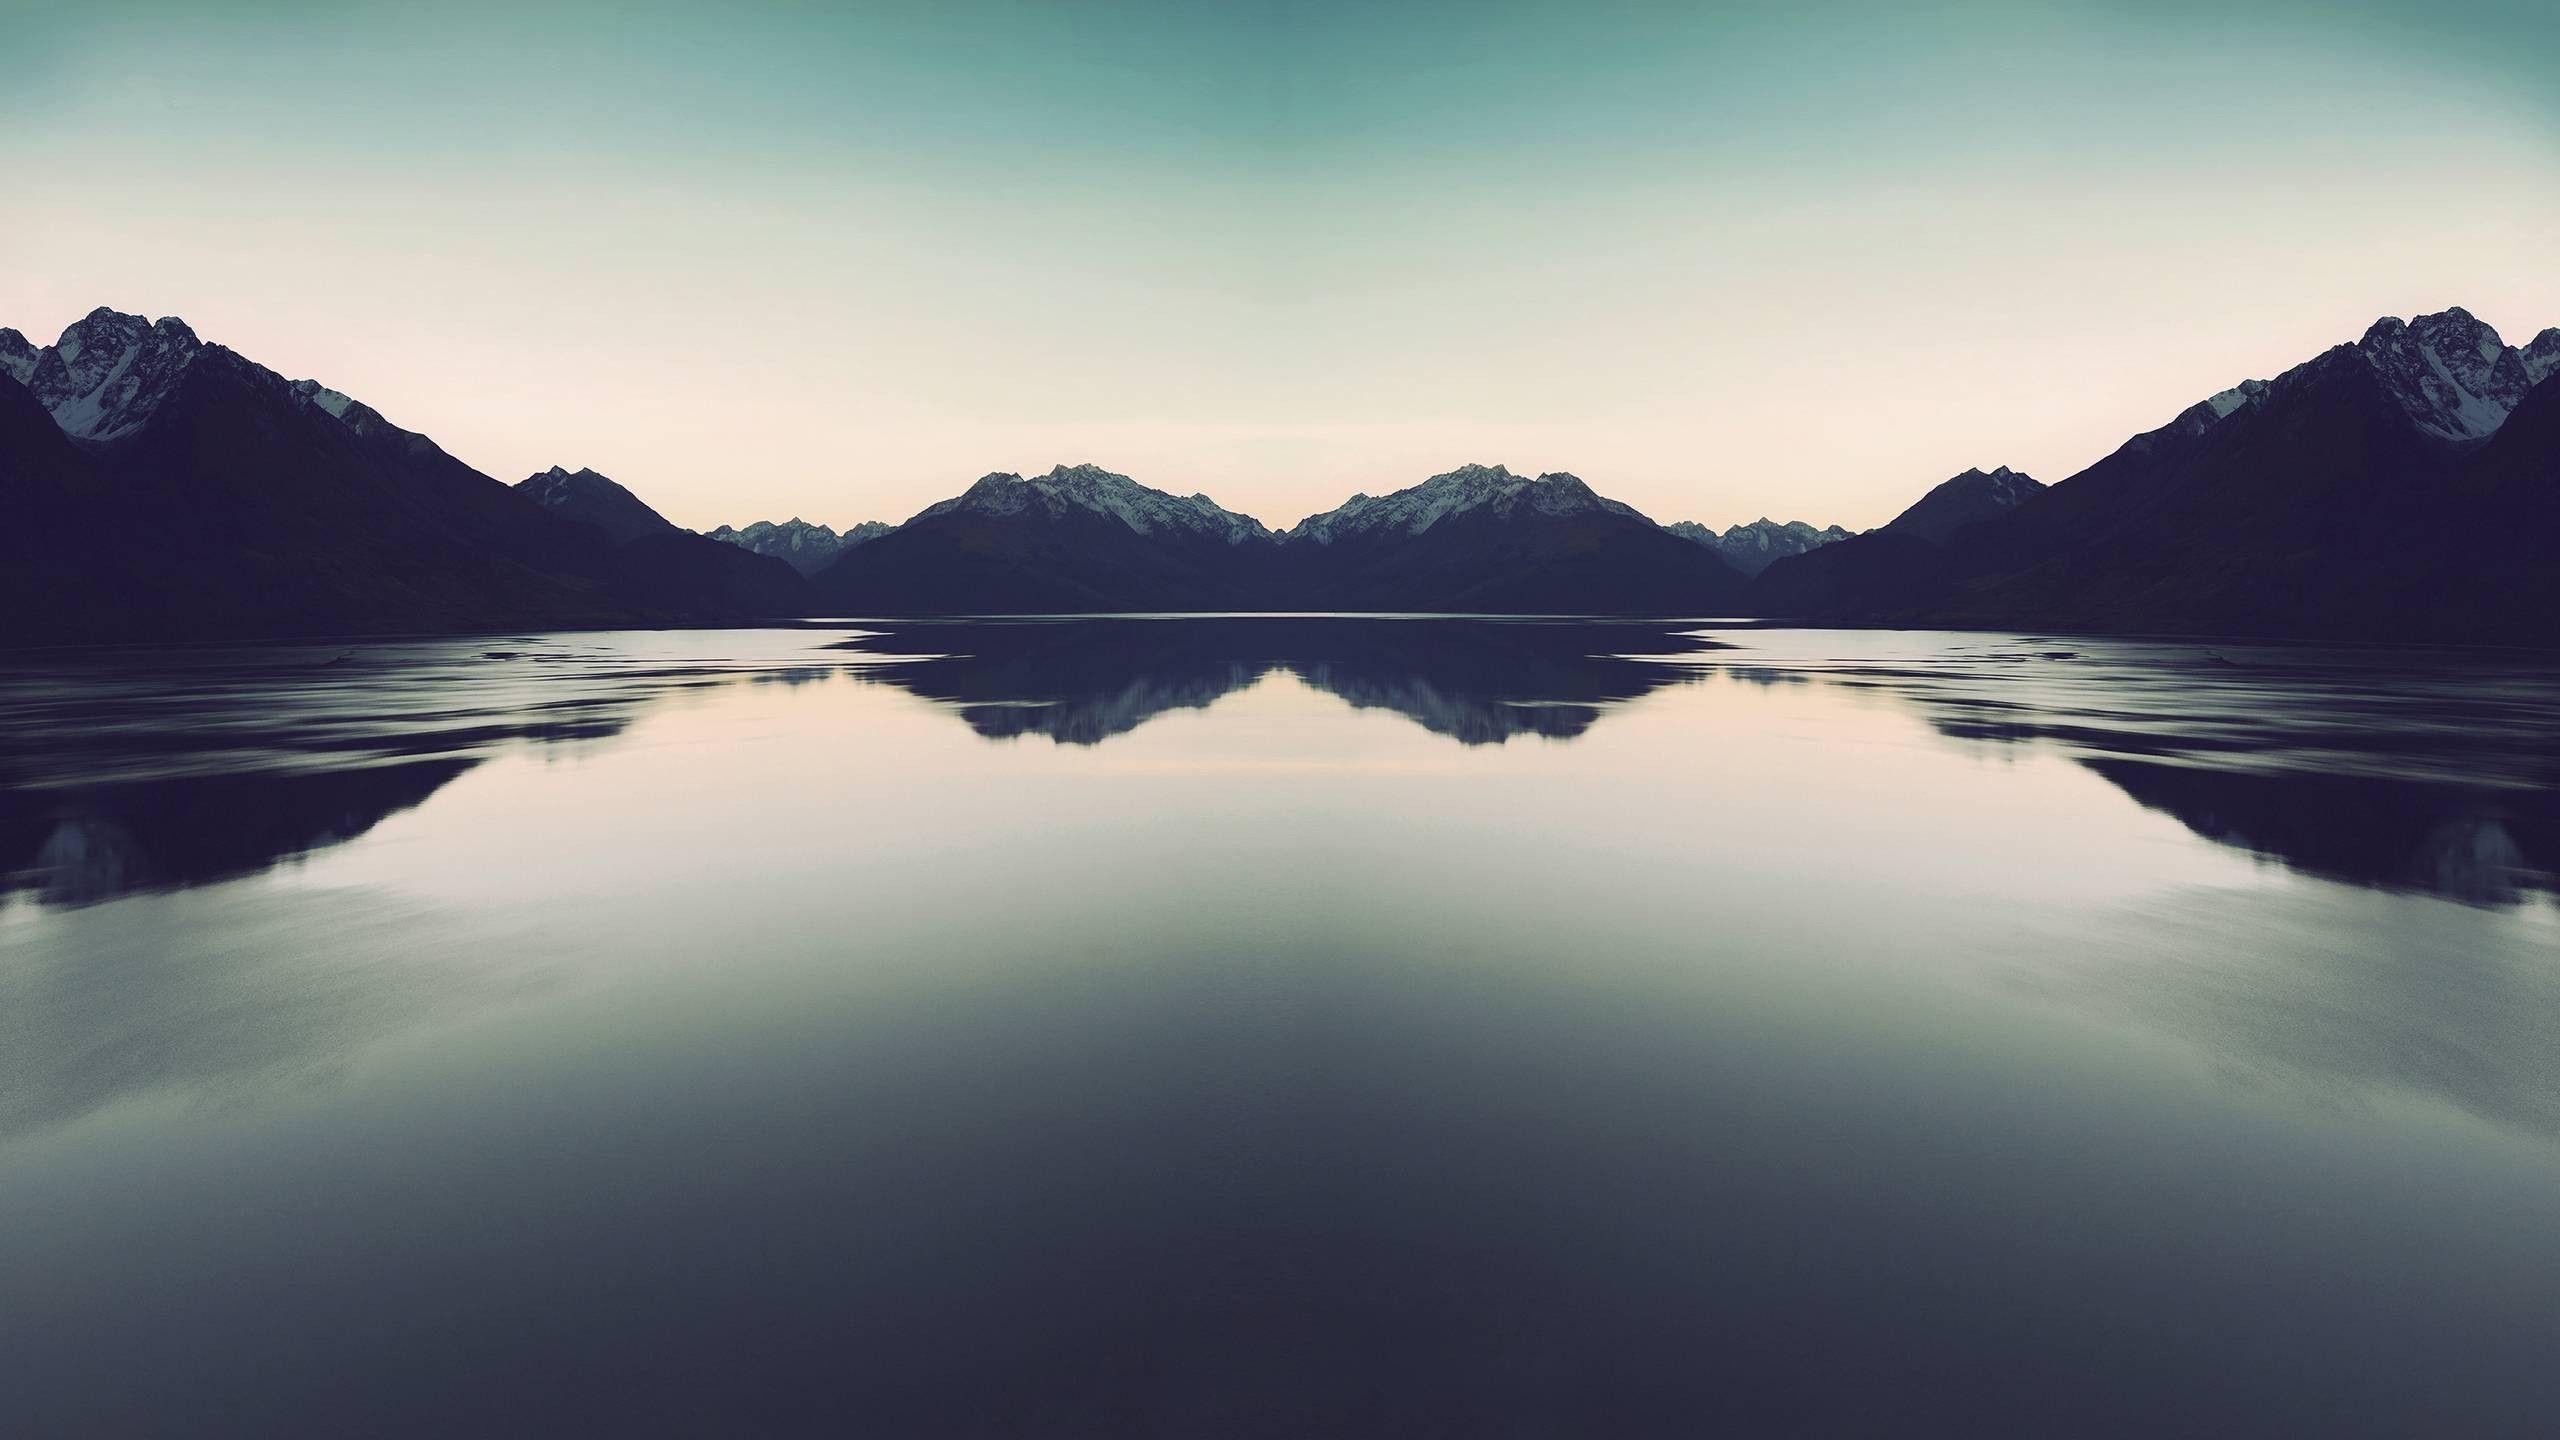 Flat Water Lakes Mountains Natural Nature 2560x1440 Water Lakes Mountains Natural Nature Via Www Allwallpaper Mountain Wallpaper Nature Wallpaper Water